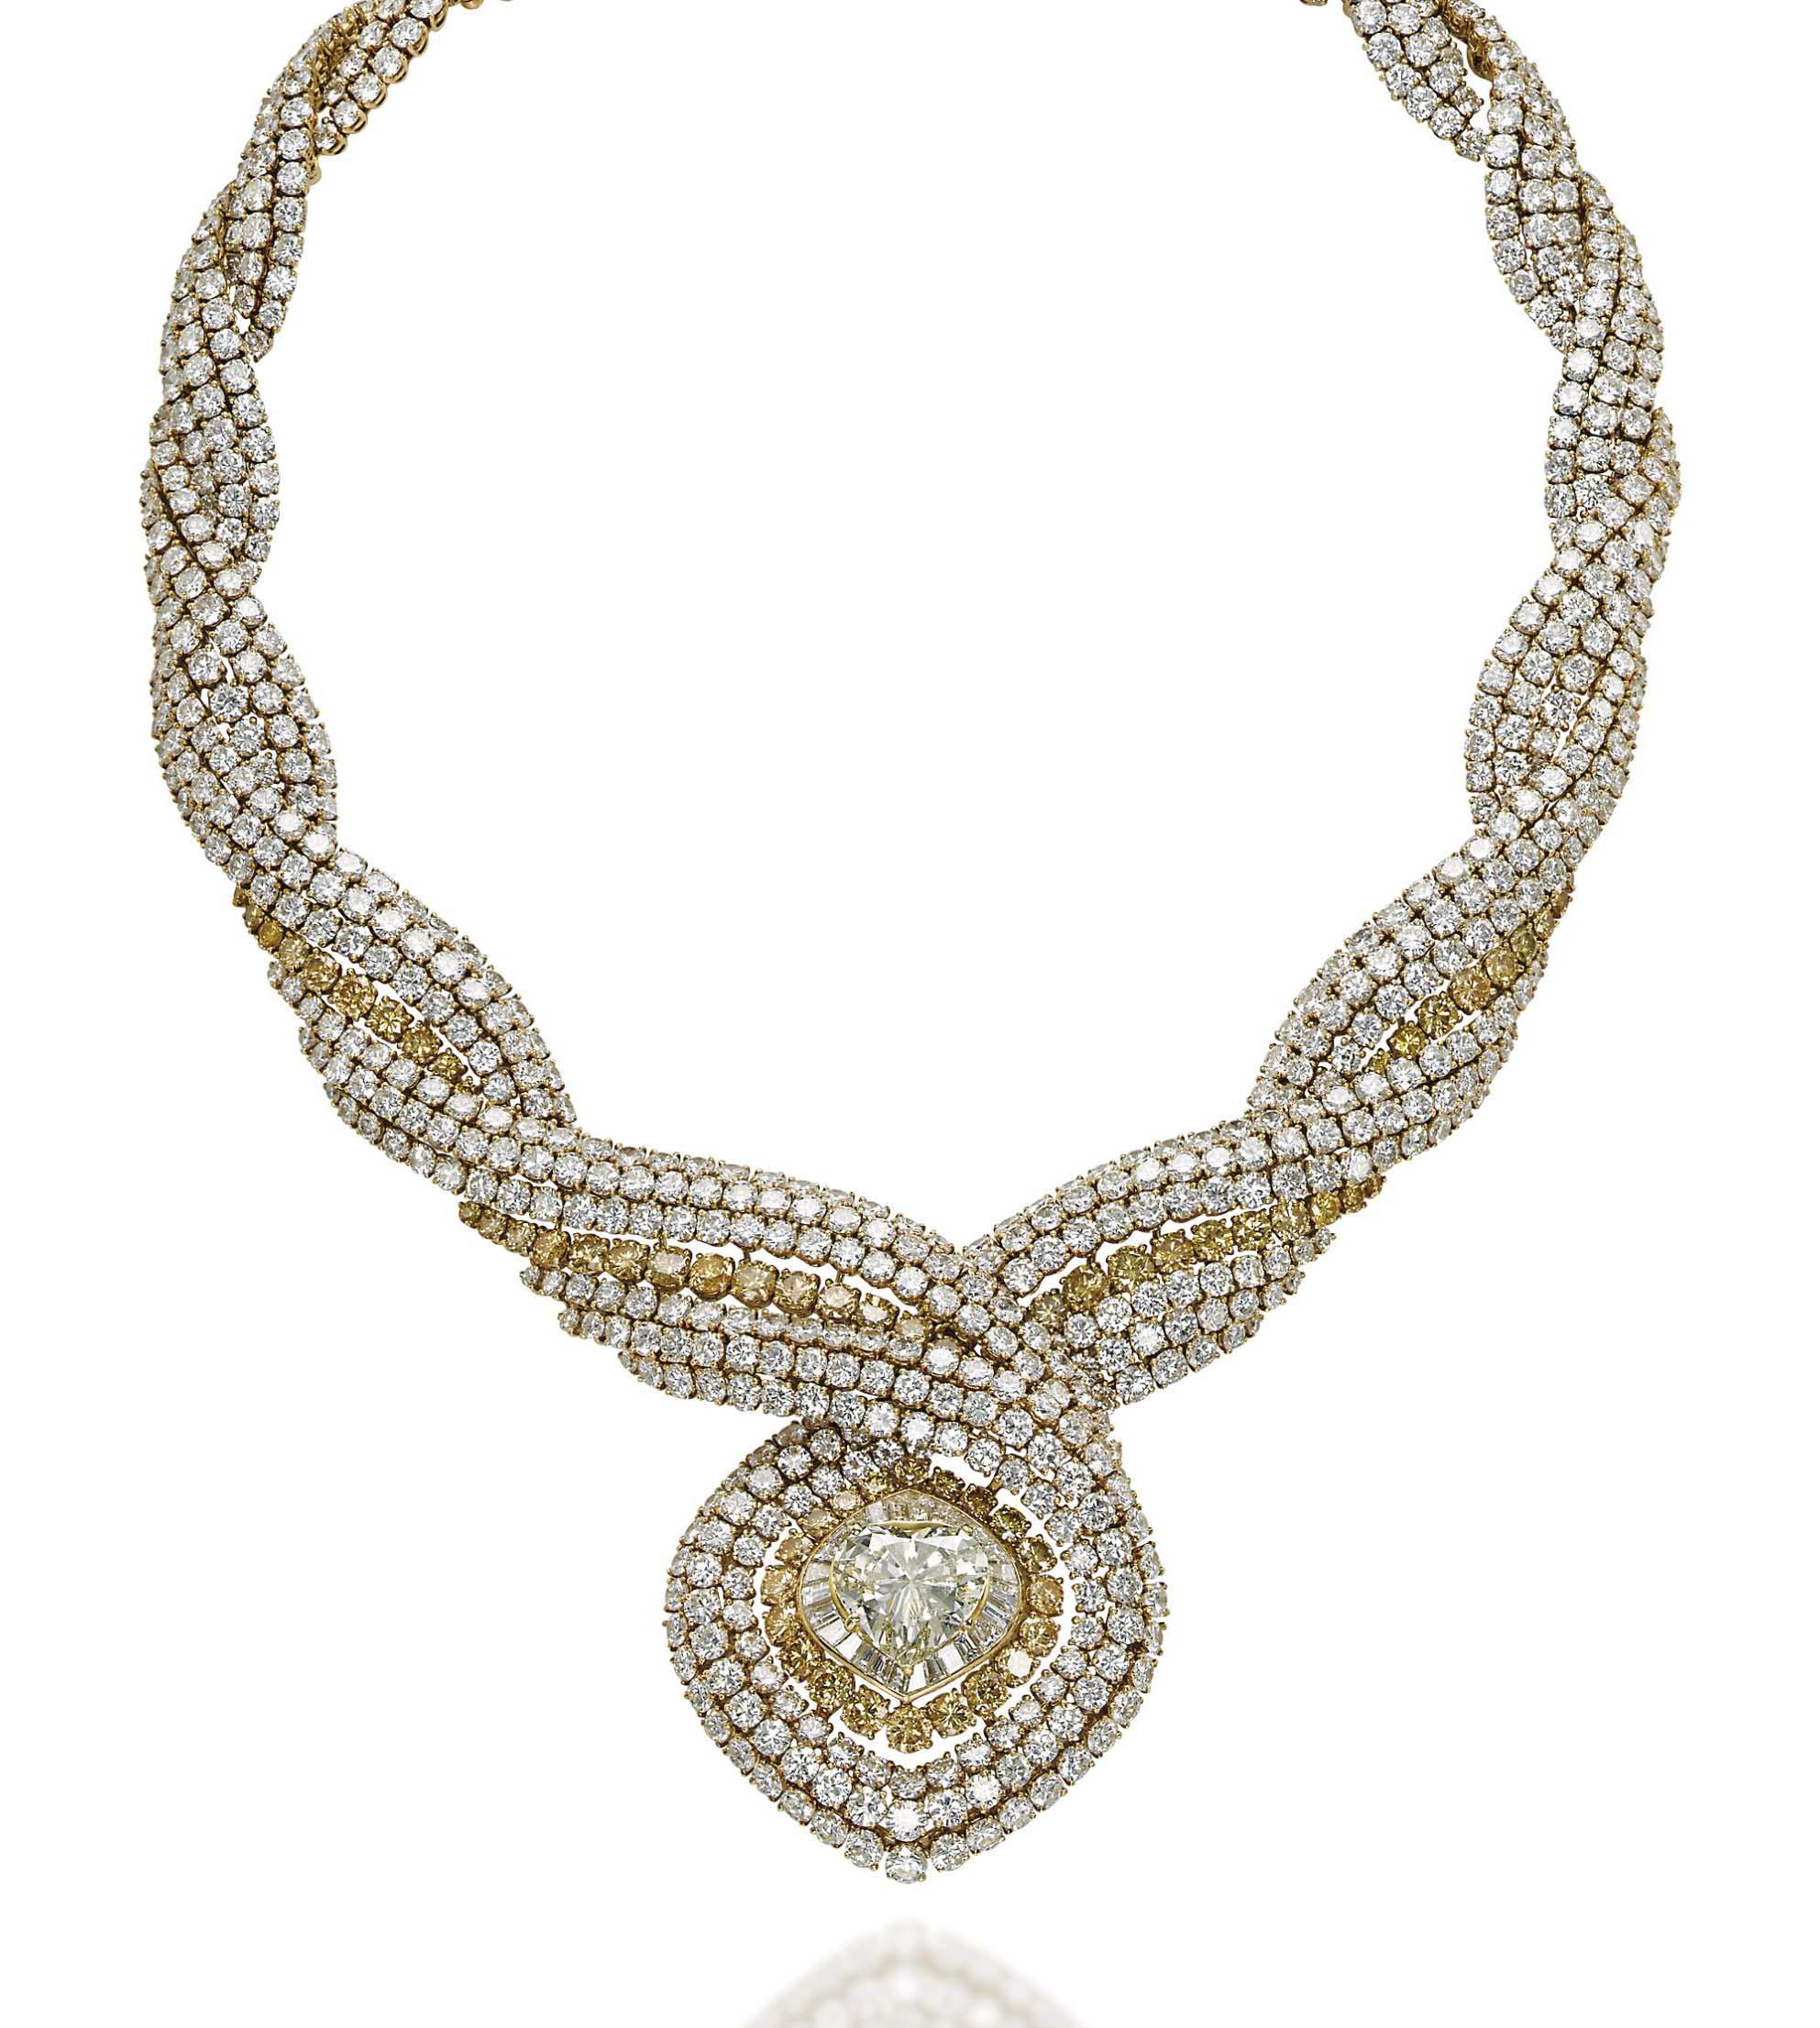 A COLOURED DIAMOND AND DIAMOND NECKLACE, BY MAUBOUSSIN